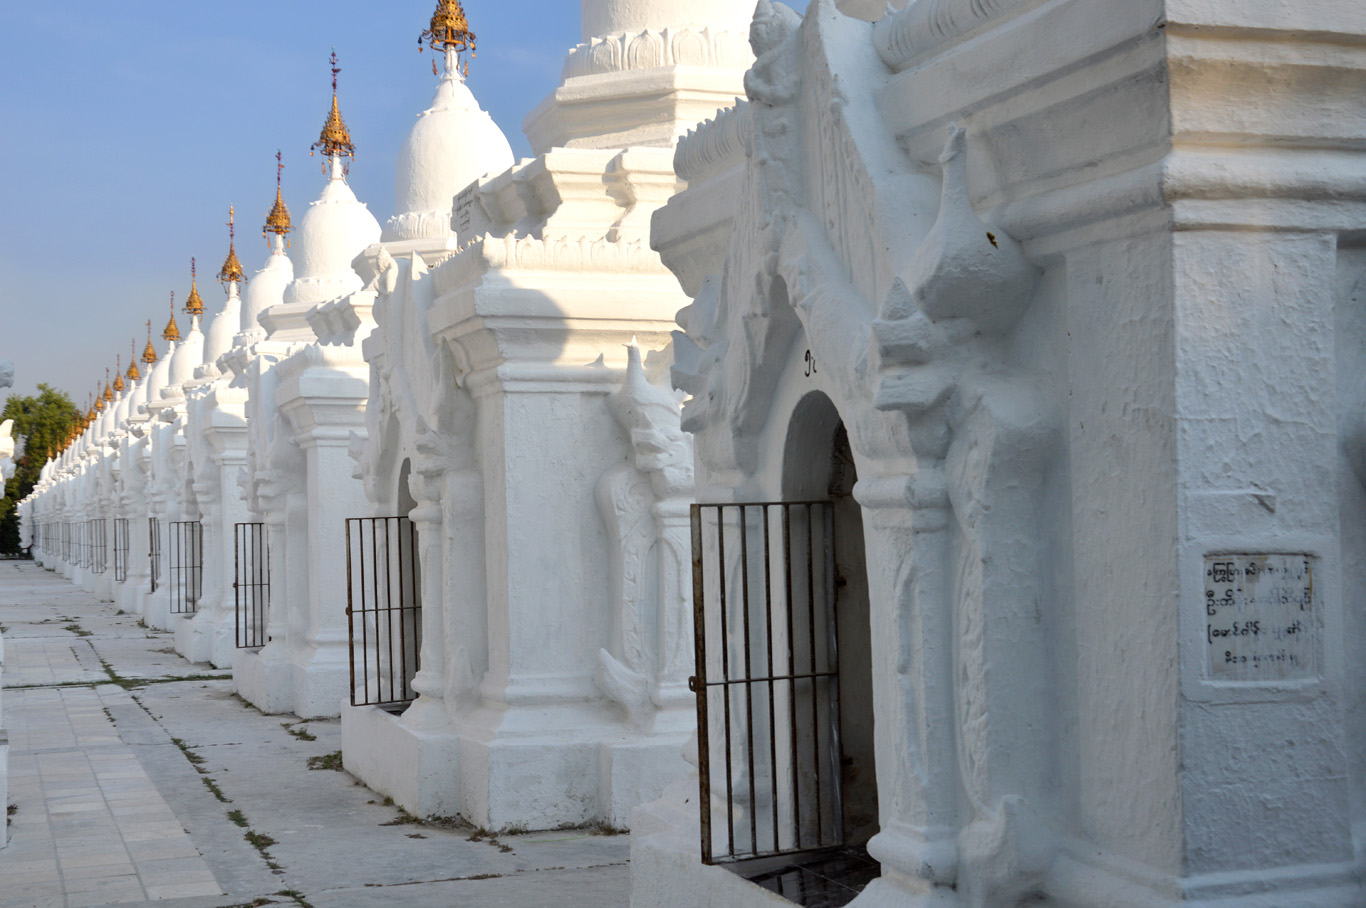 Stupas housing the inscription plates - the world's largest book